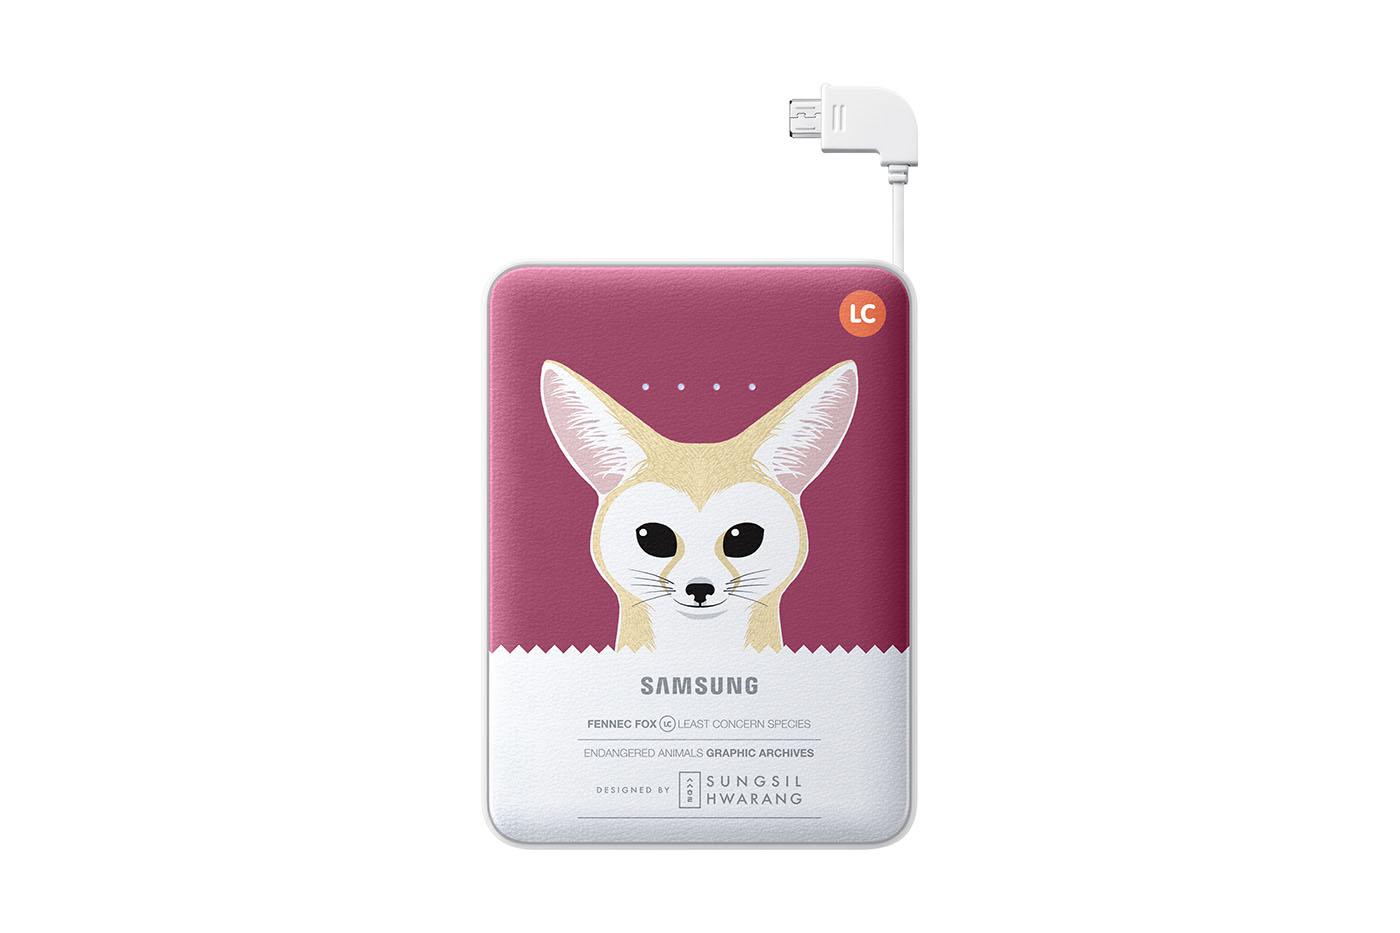 Samsung Battery Pack_FENNEC FOX 8